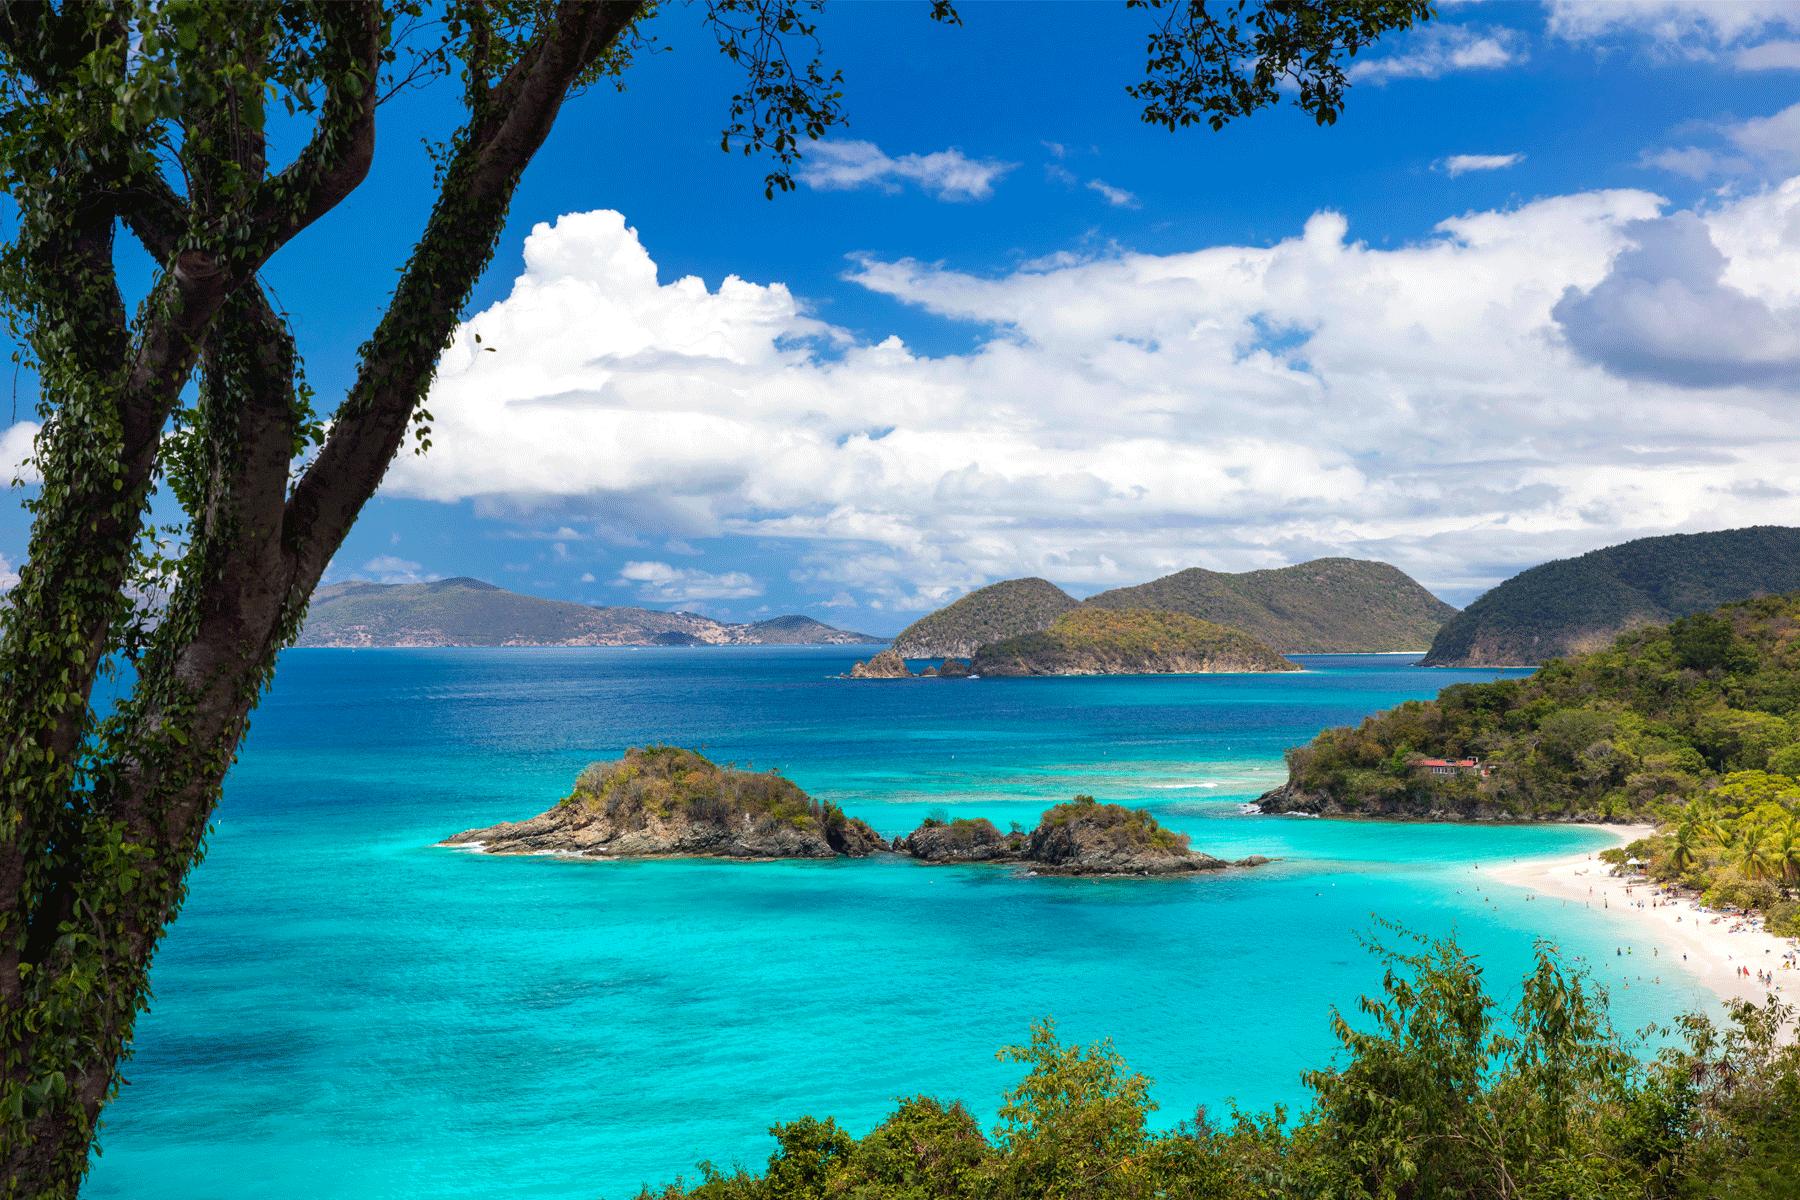 iconic-viewpoint-st-croiz-virgin-islands